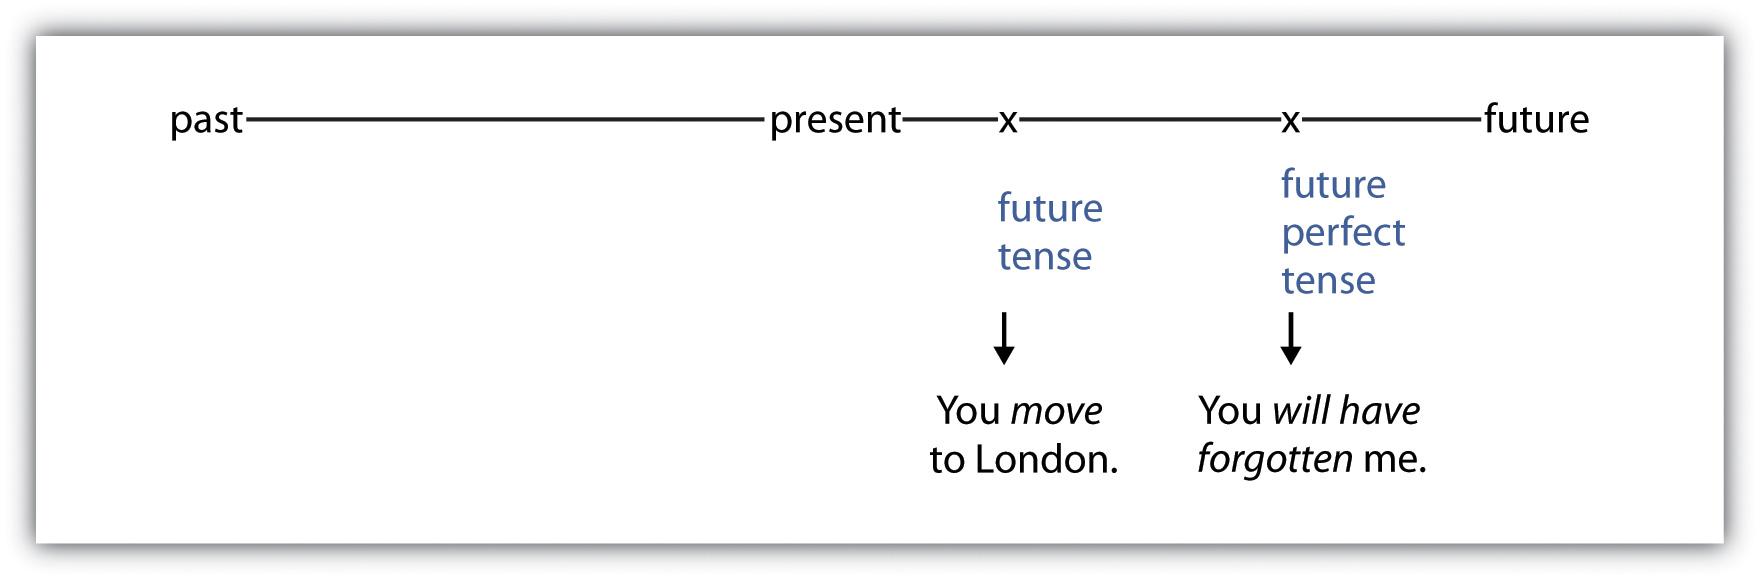 You move to London (future tense). You will have forgotten me (future perfect tense).